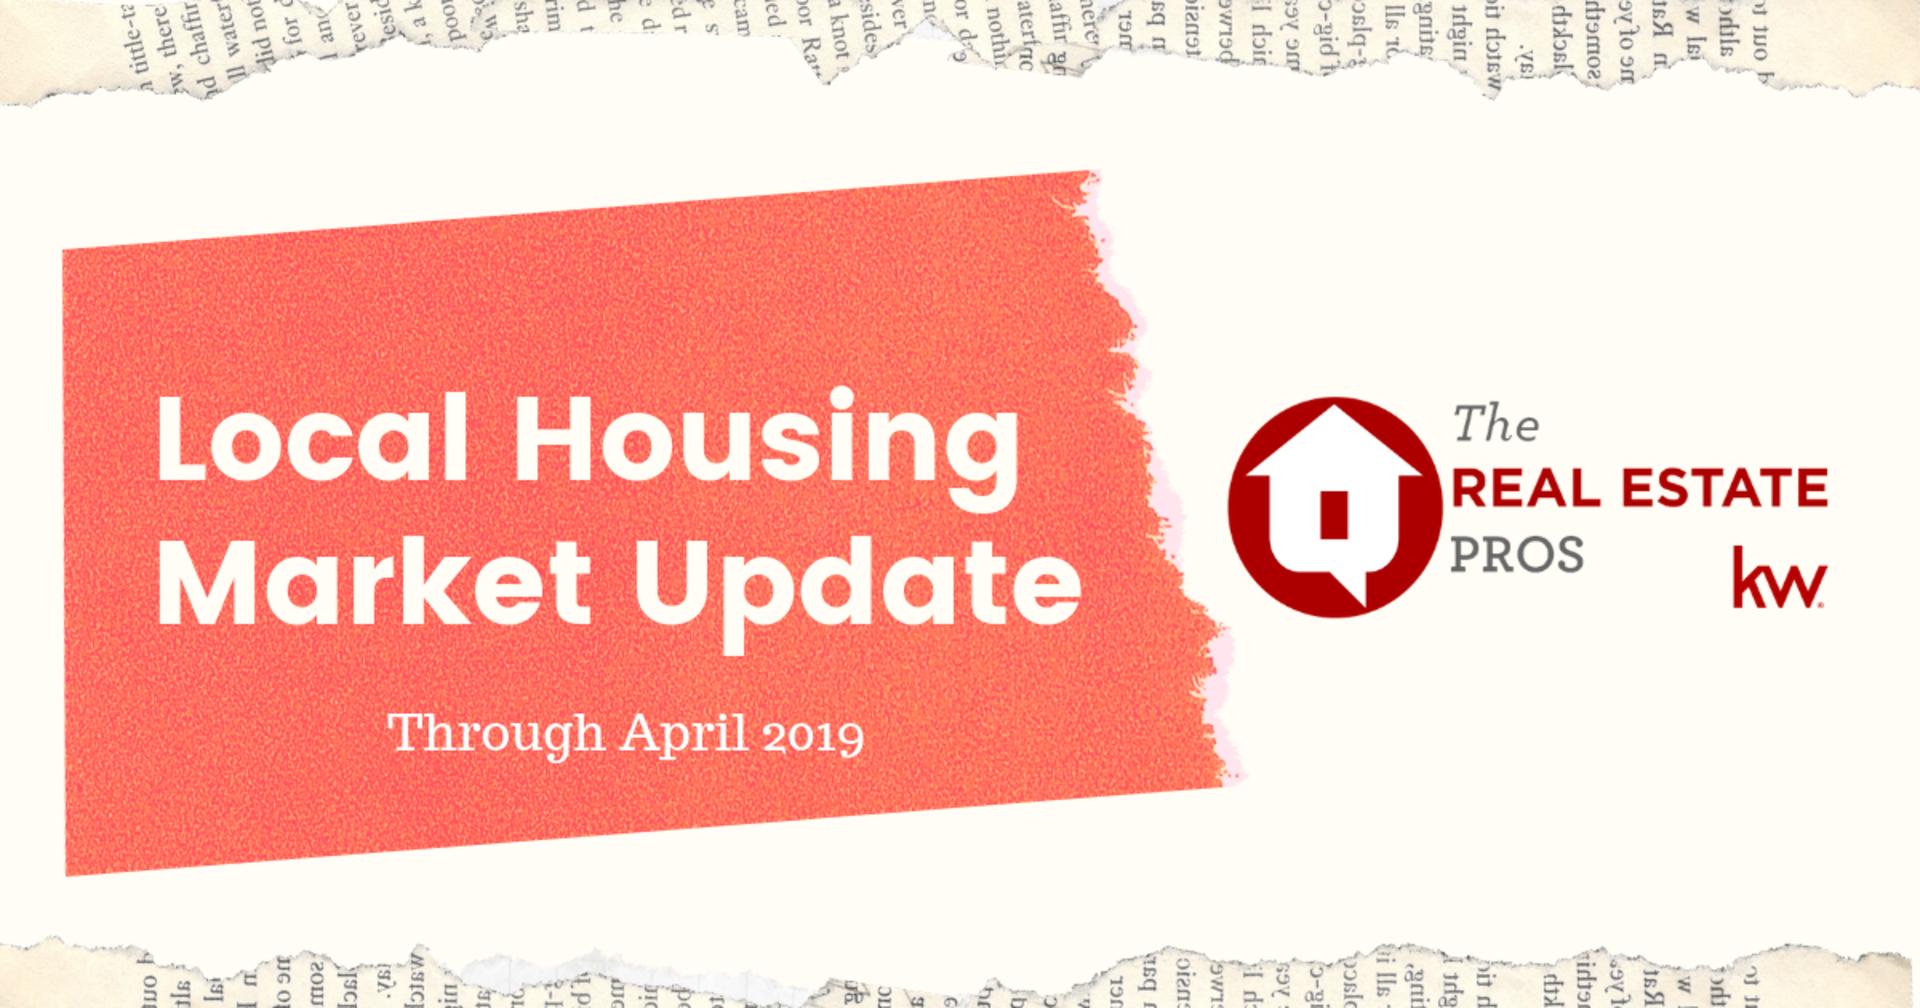 Local Housing Market News through April '19